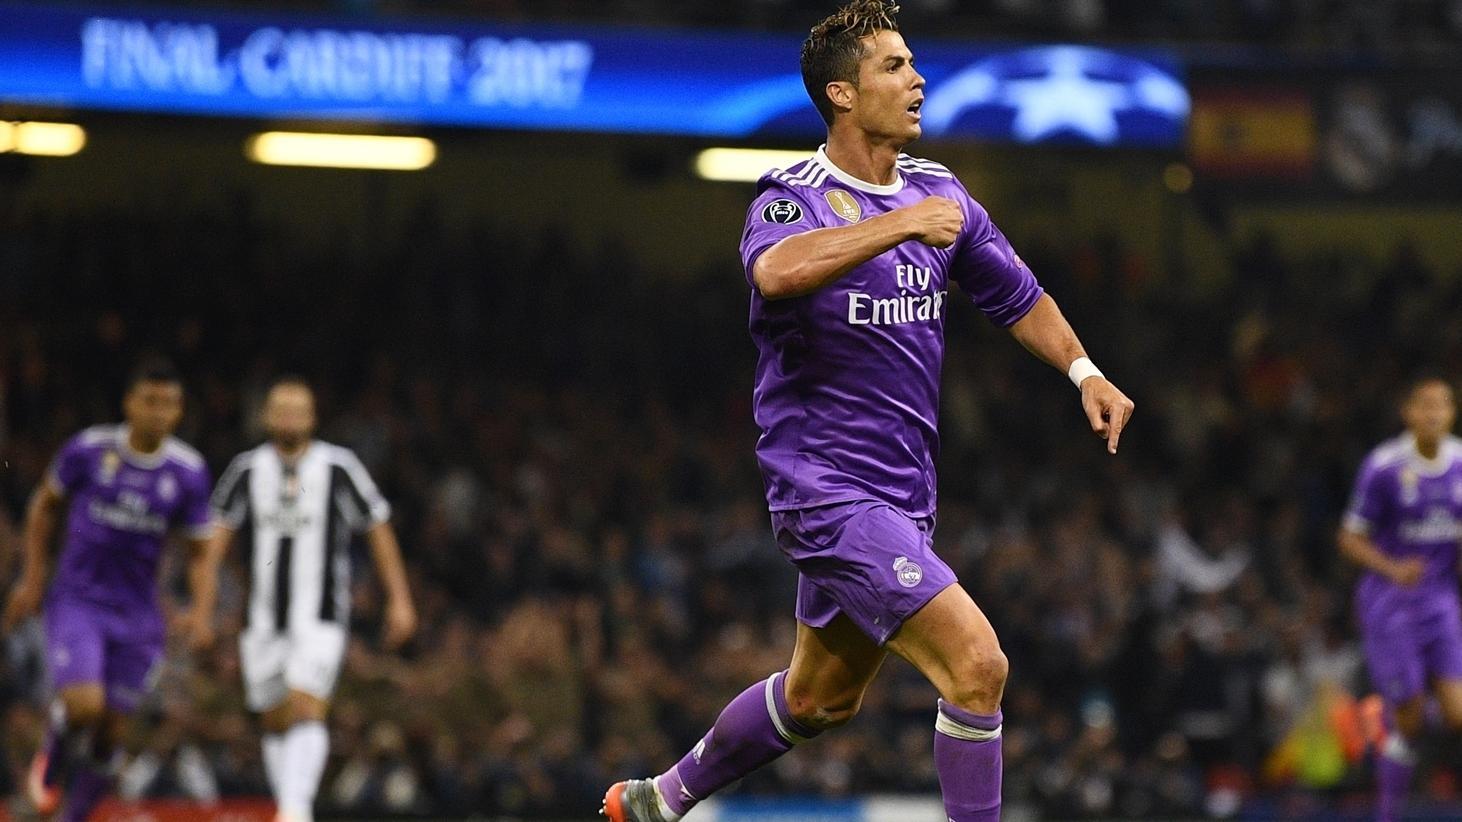 Cristiano Ronaldo Makes History By Scoring In Third Final Uefa Champions League Uefa Com